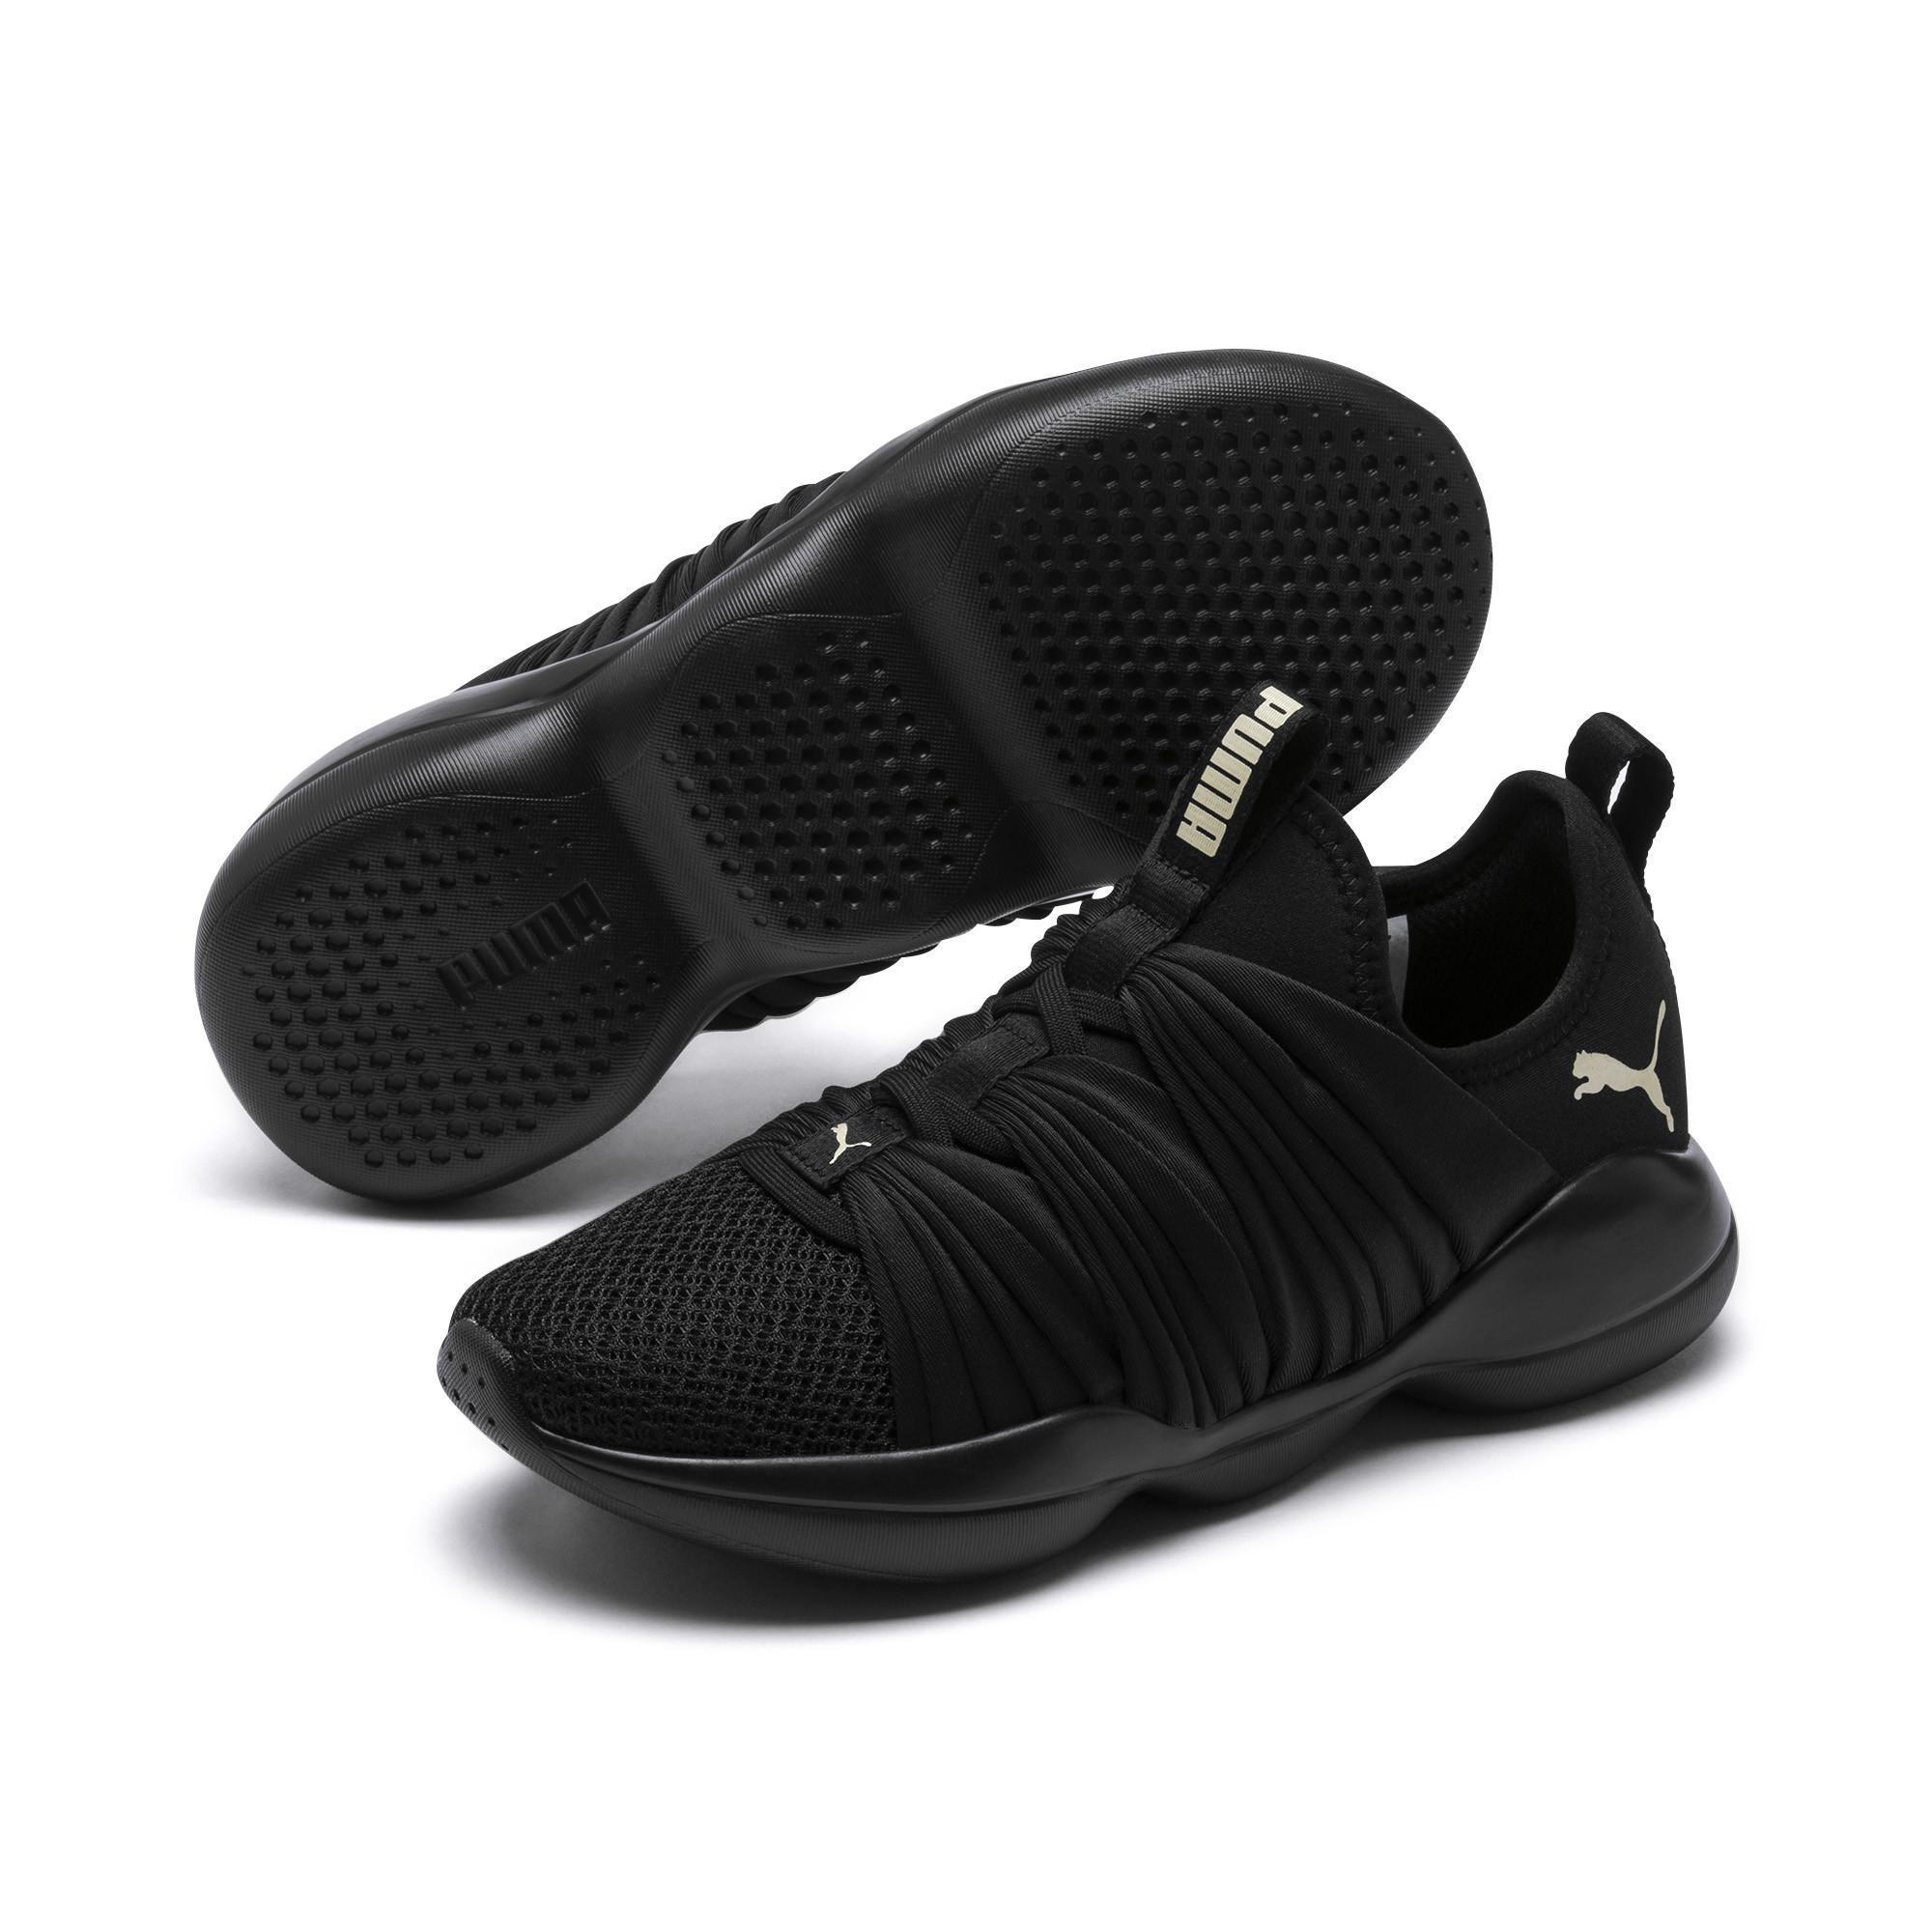 PUMA - Black Flourish Women s Training Shoes - Lyst. View fullscreen 2243ad103